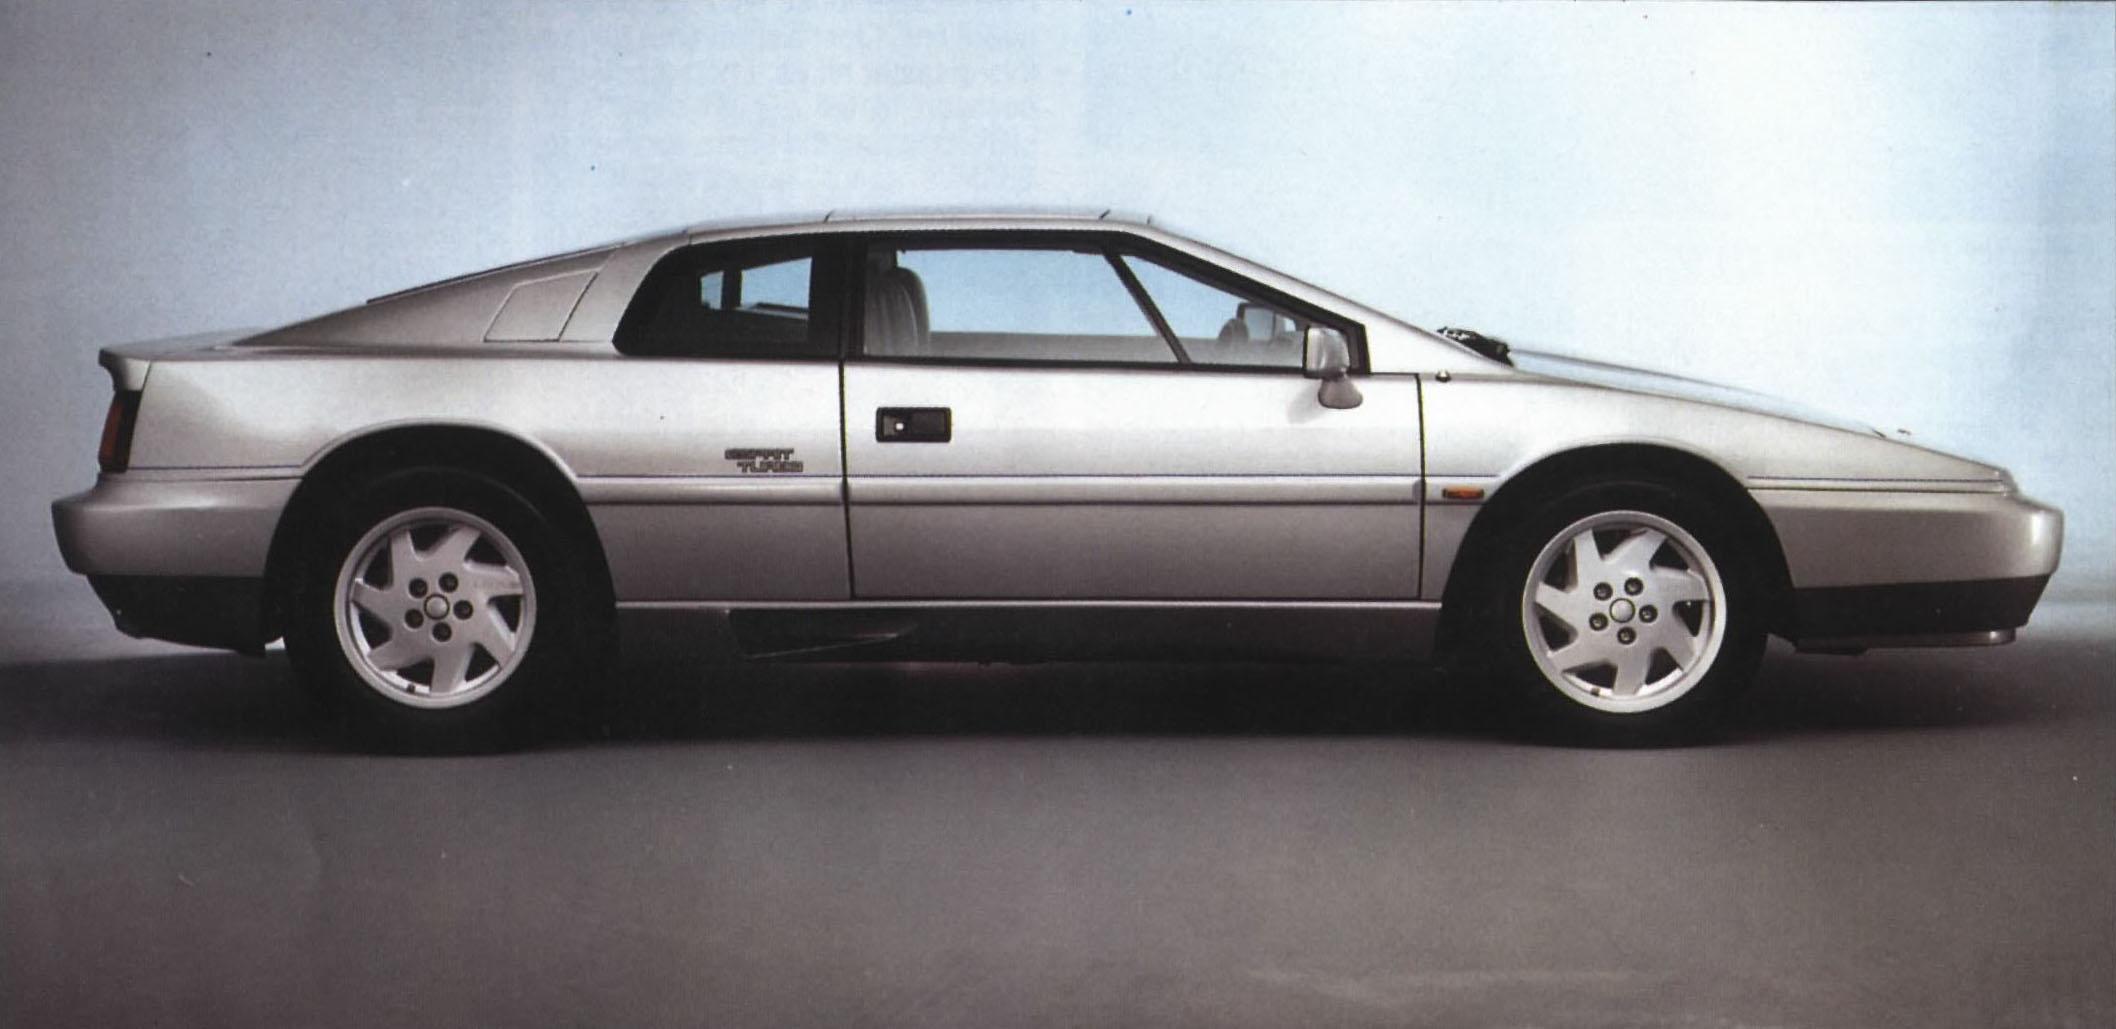 Lotus Esprit IV 1987 - 1993 Coupe #3